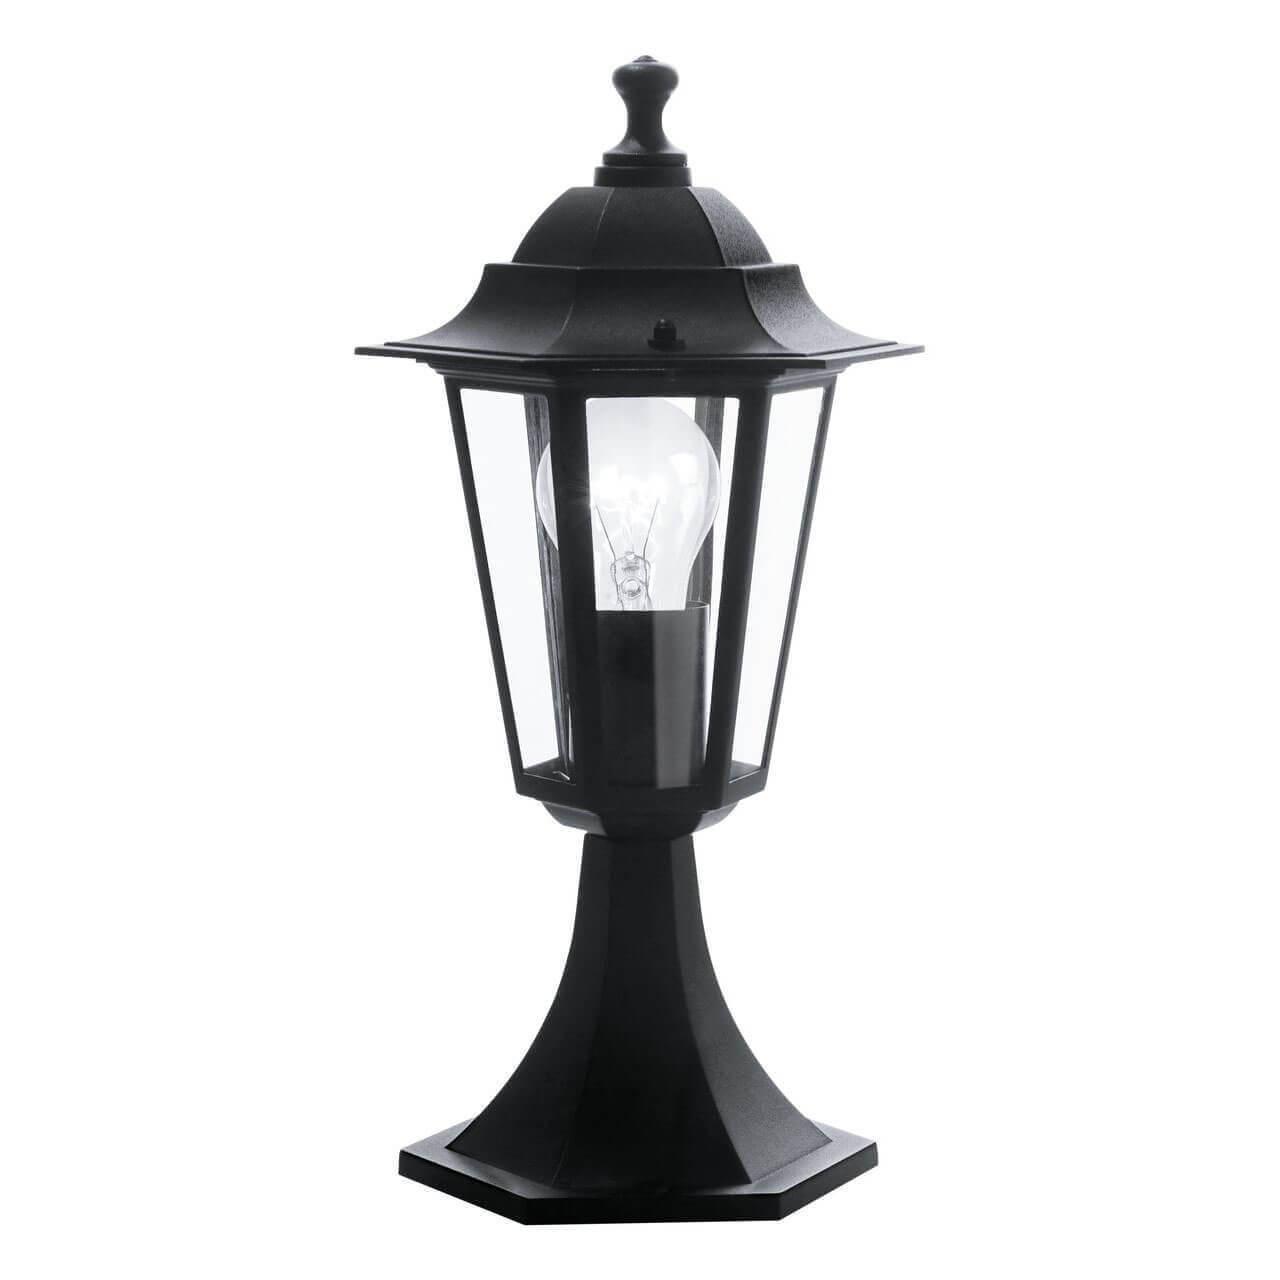 Уличный светильник Eglo Laterna 4 22472